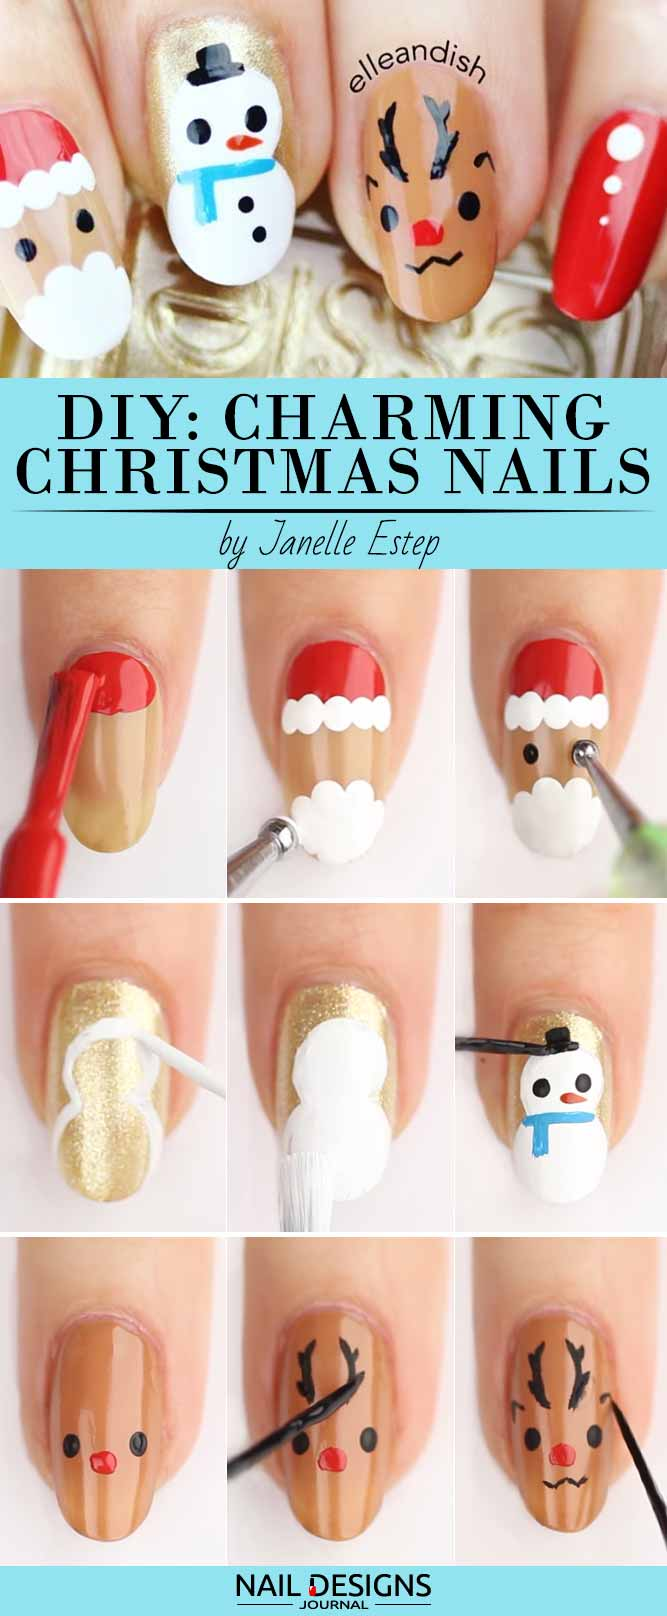 10 Charming Christmas Nail Art Tutorials You\'ll Adore - crazyforus